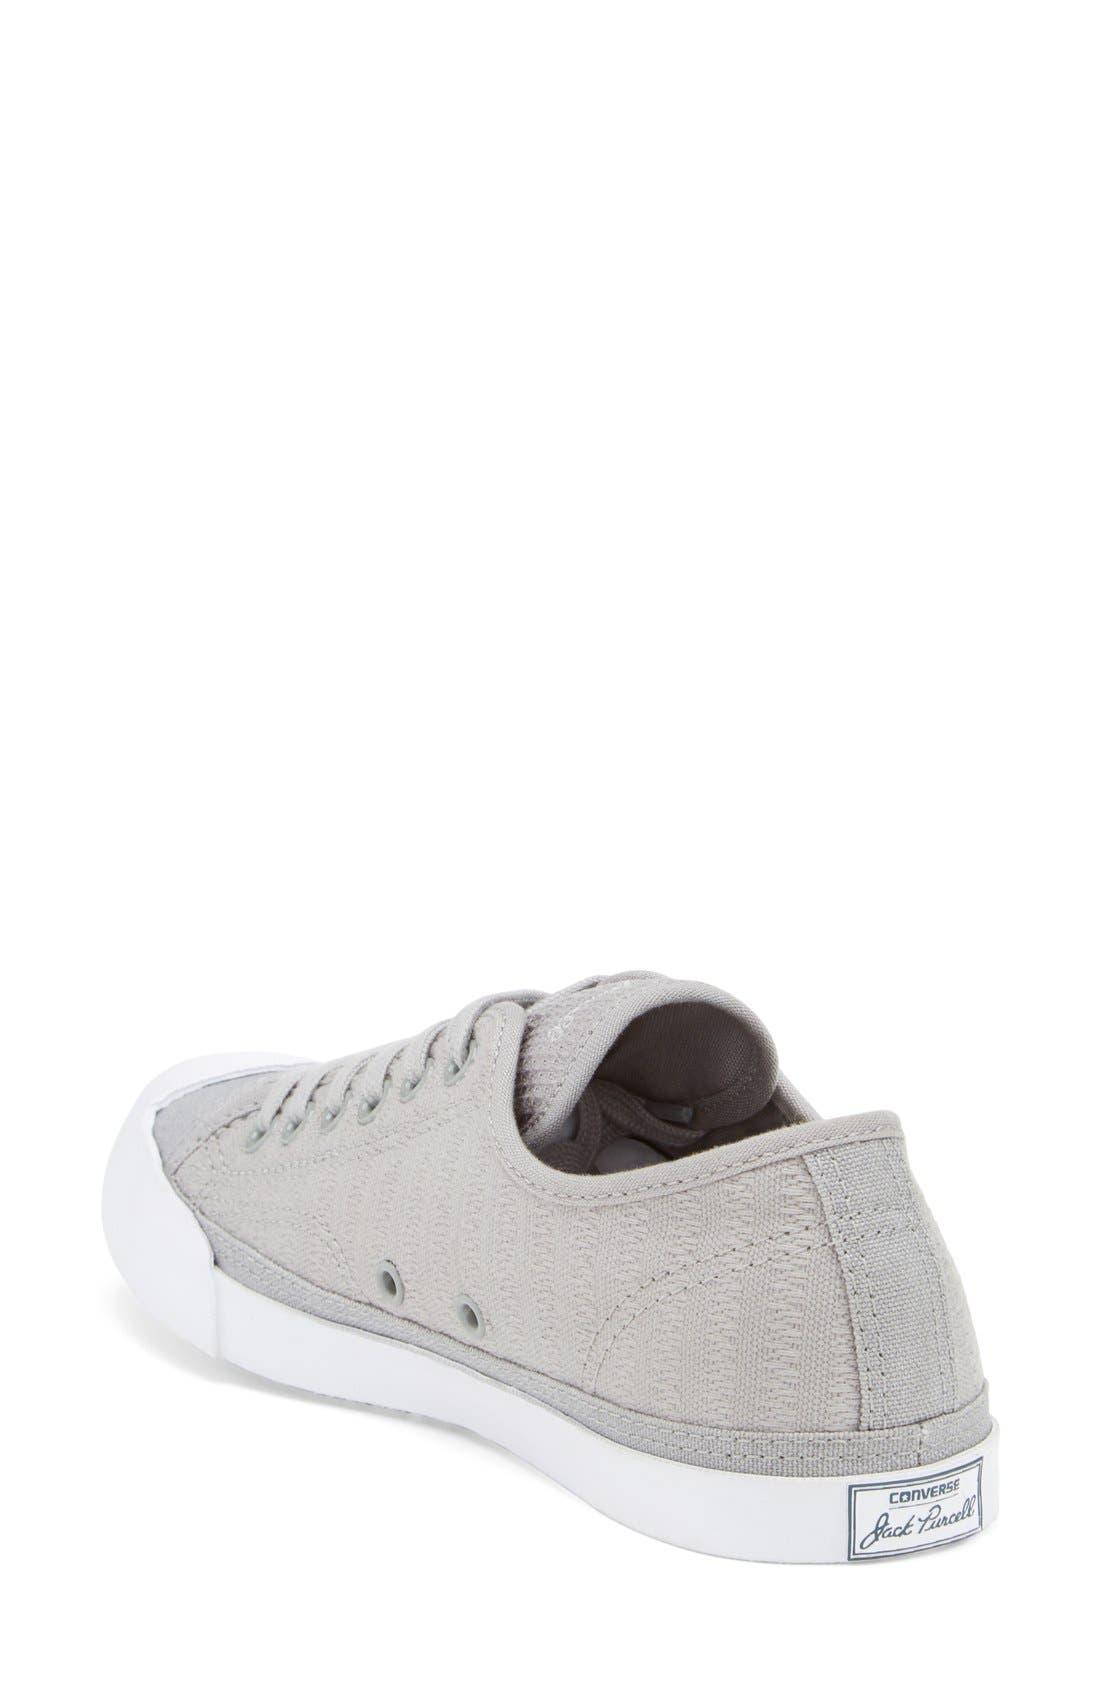 'Jack Purcell' Garment Dye Low Top Sneaker,                             Alternate thumbnail 6, color,